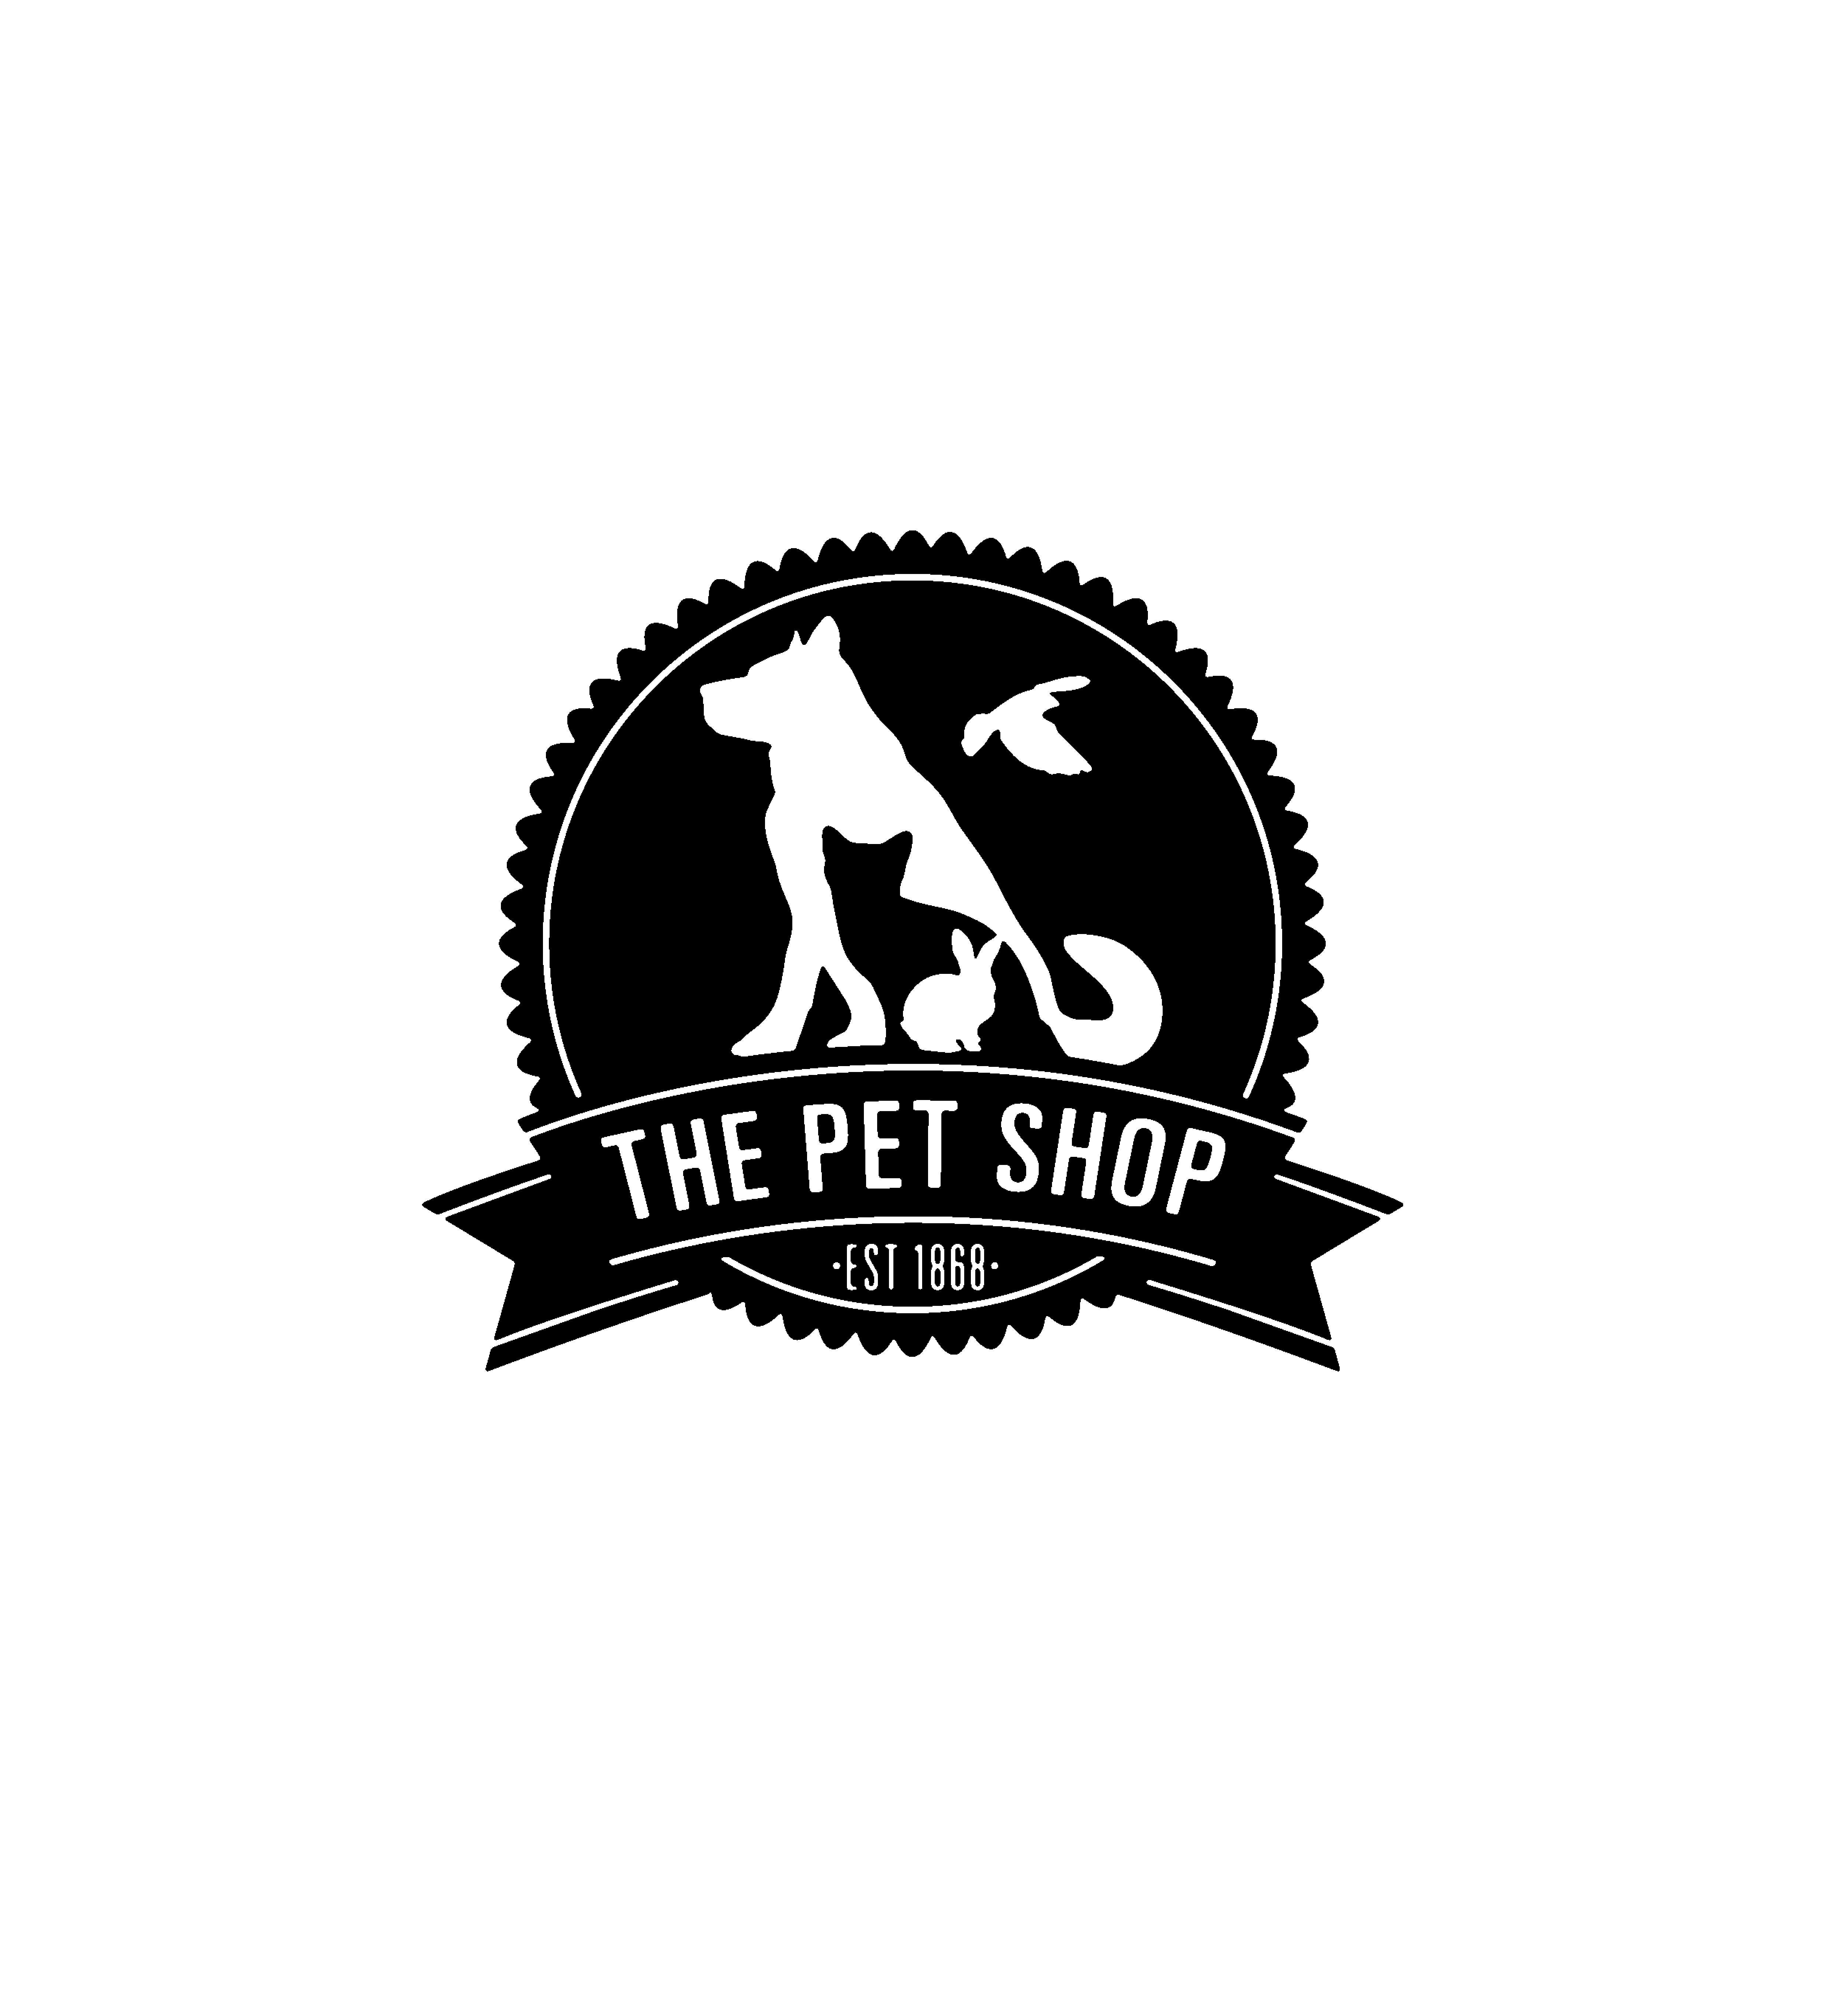 The Pet Shop Ripon Logotype Designed By Toby Designs Logos